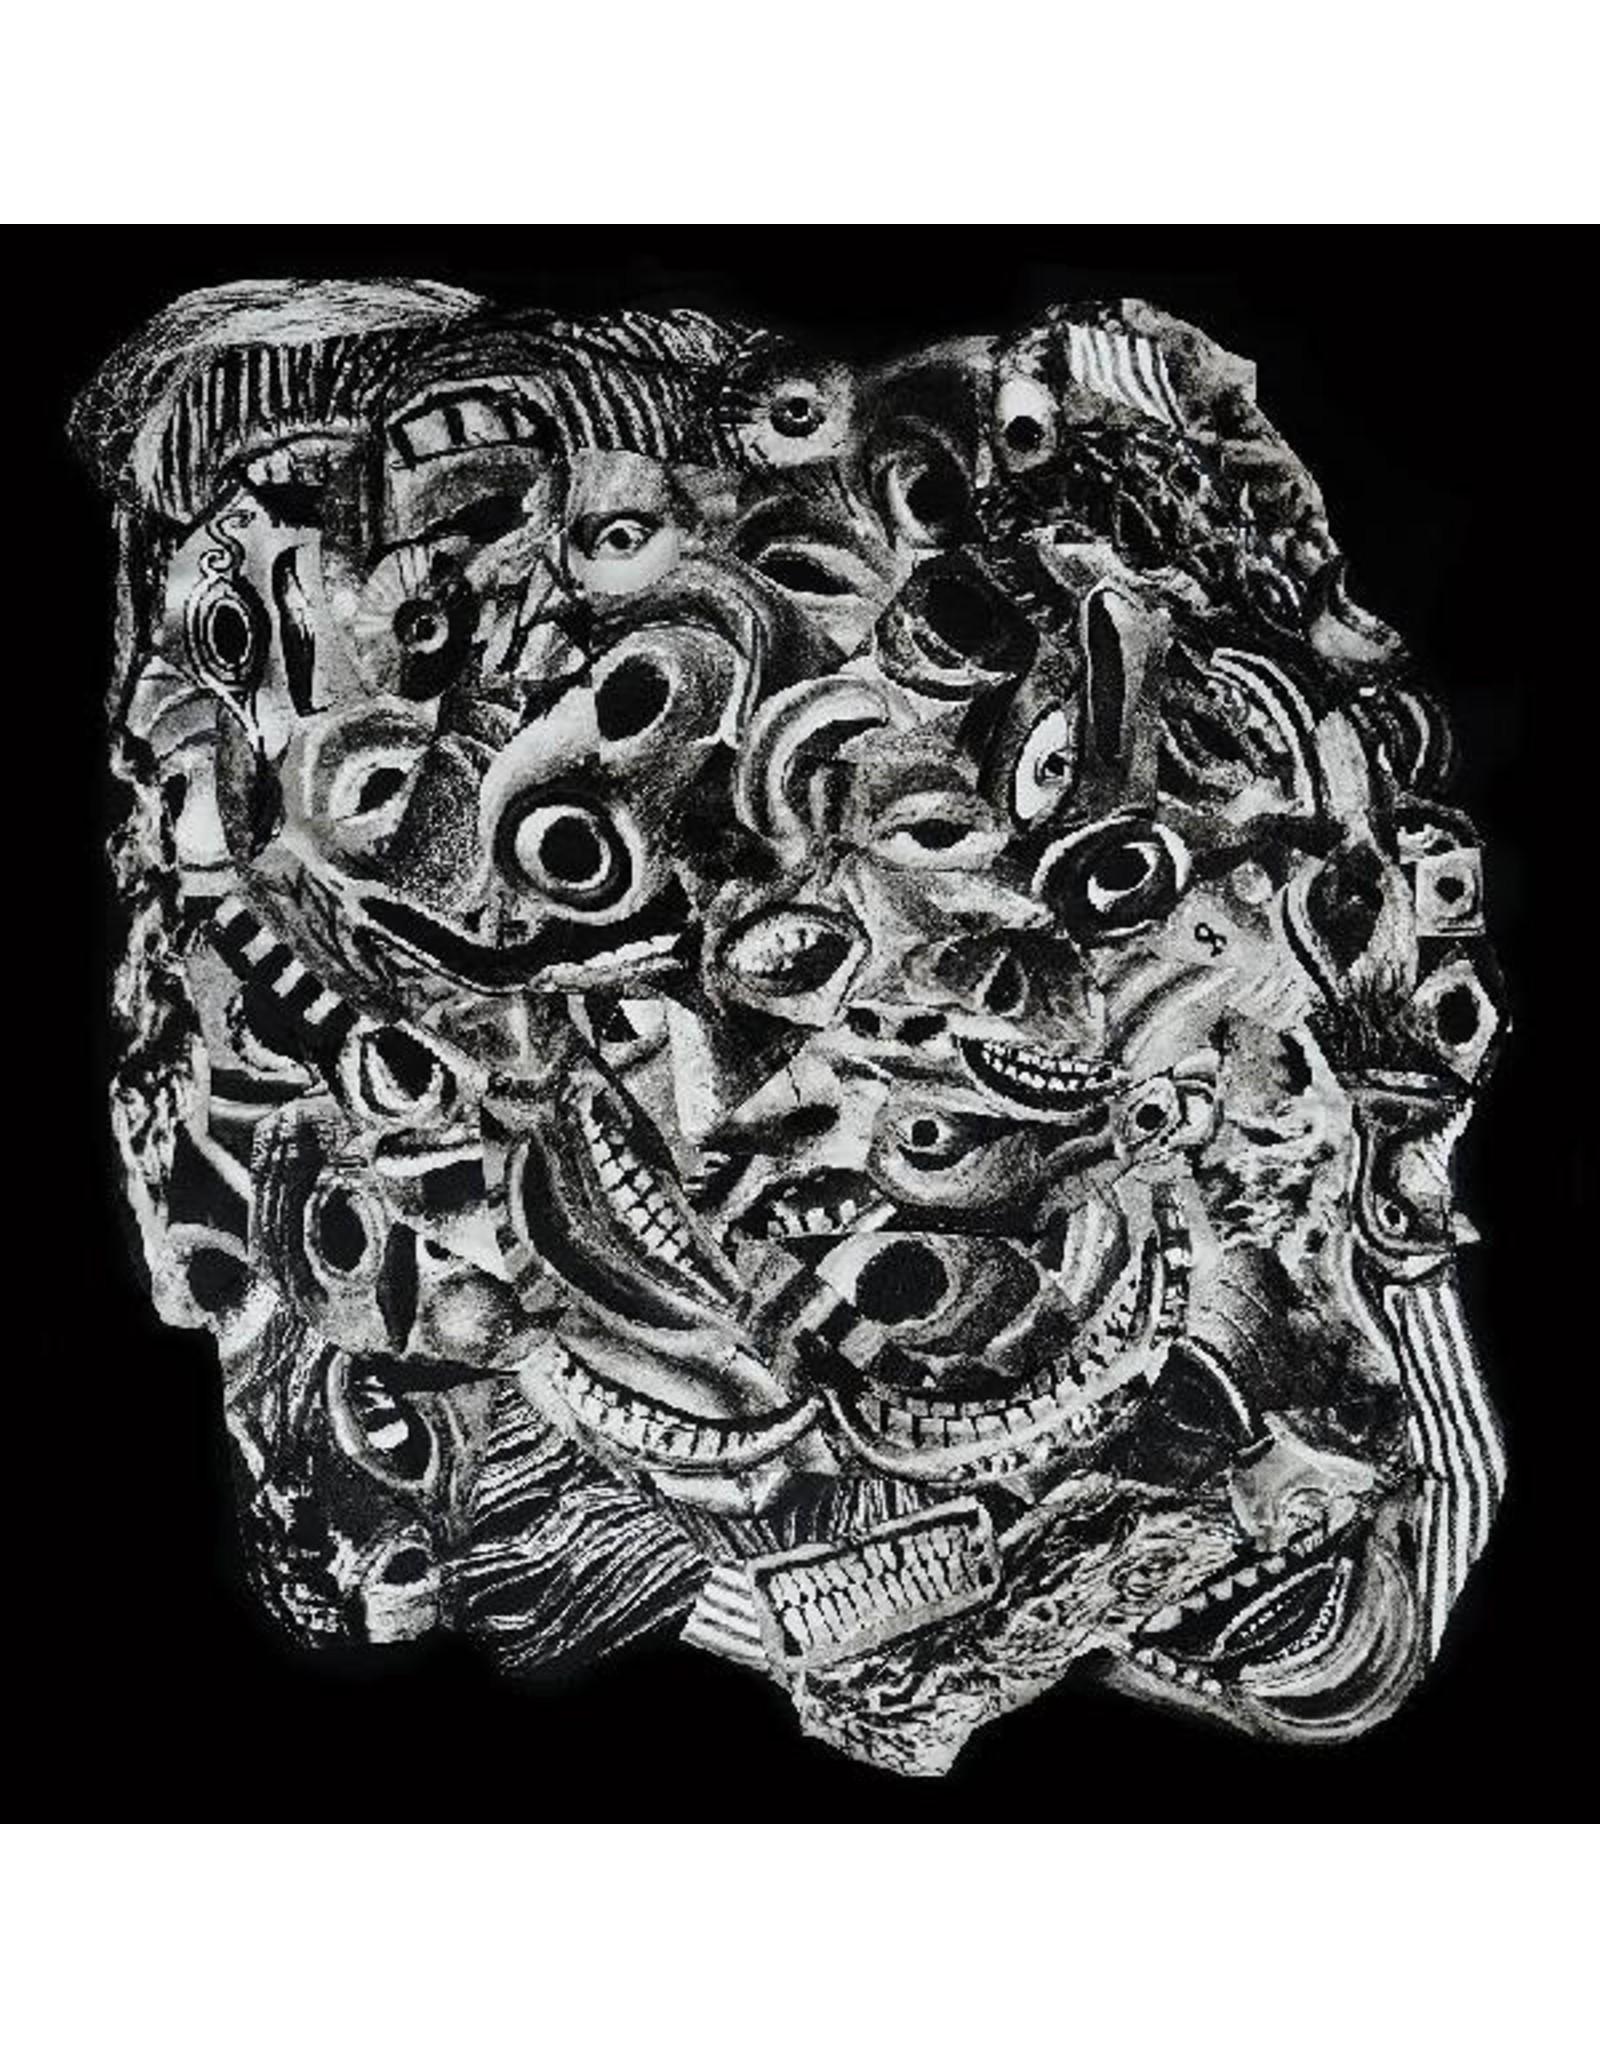 New Vinyl Bill Nace - Both, Parts 1-8 LP